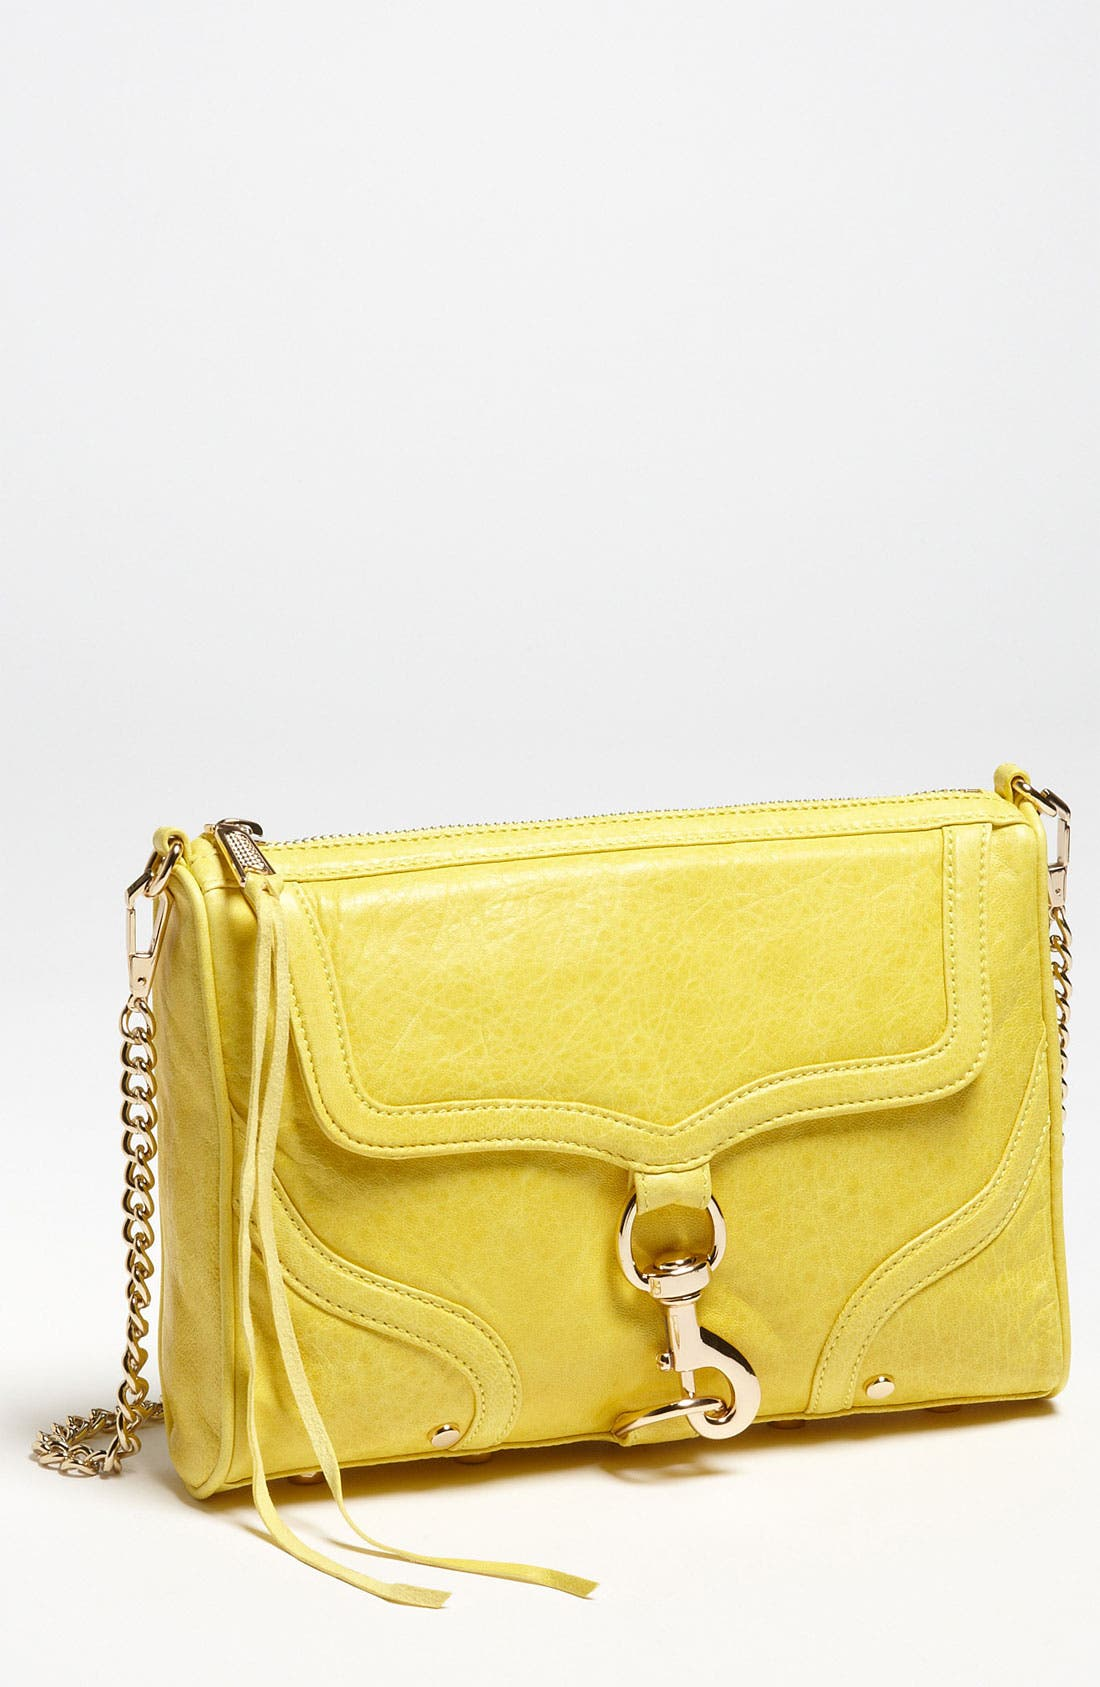 Main Image - Rebecca Minkoff 'MAC Bombe' Shoulder Bag